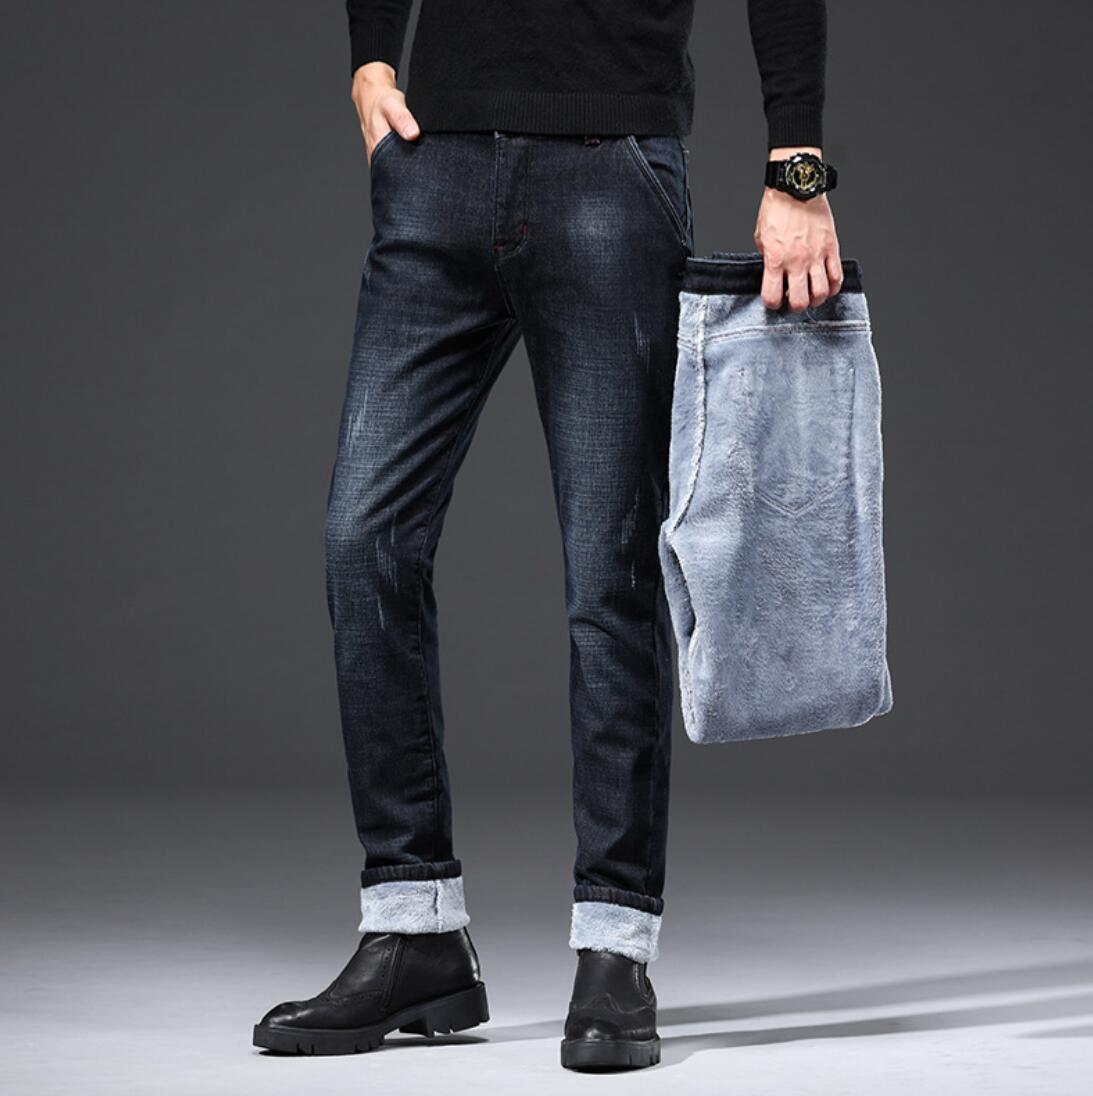 HOT 2020 Autumn Men's Jeans Casual Black Fashion Slim New Straight Stretch Men's Jeans KK7722-1-15